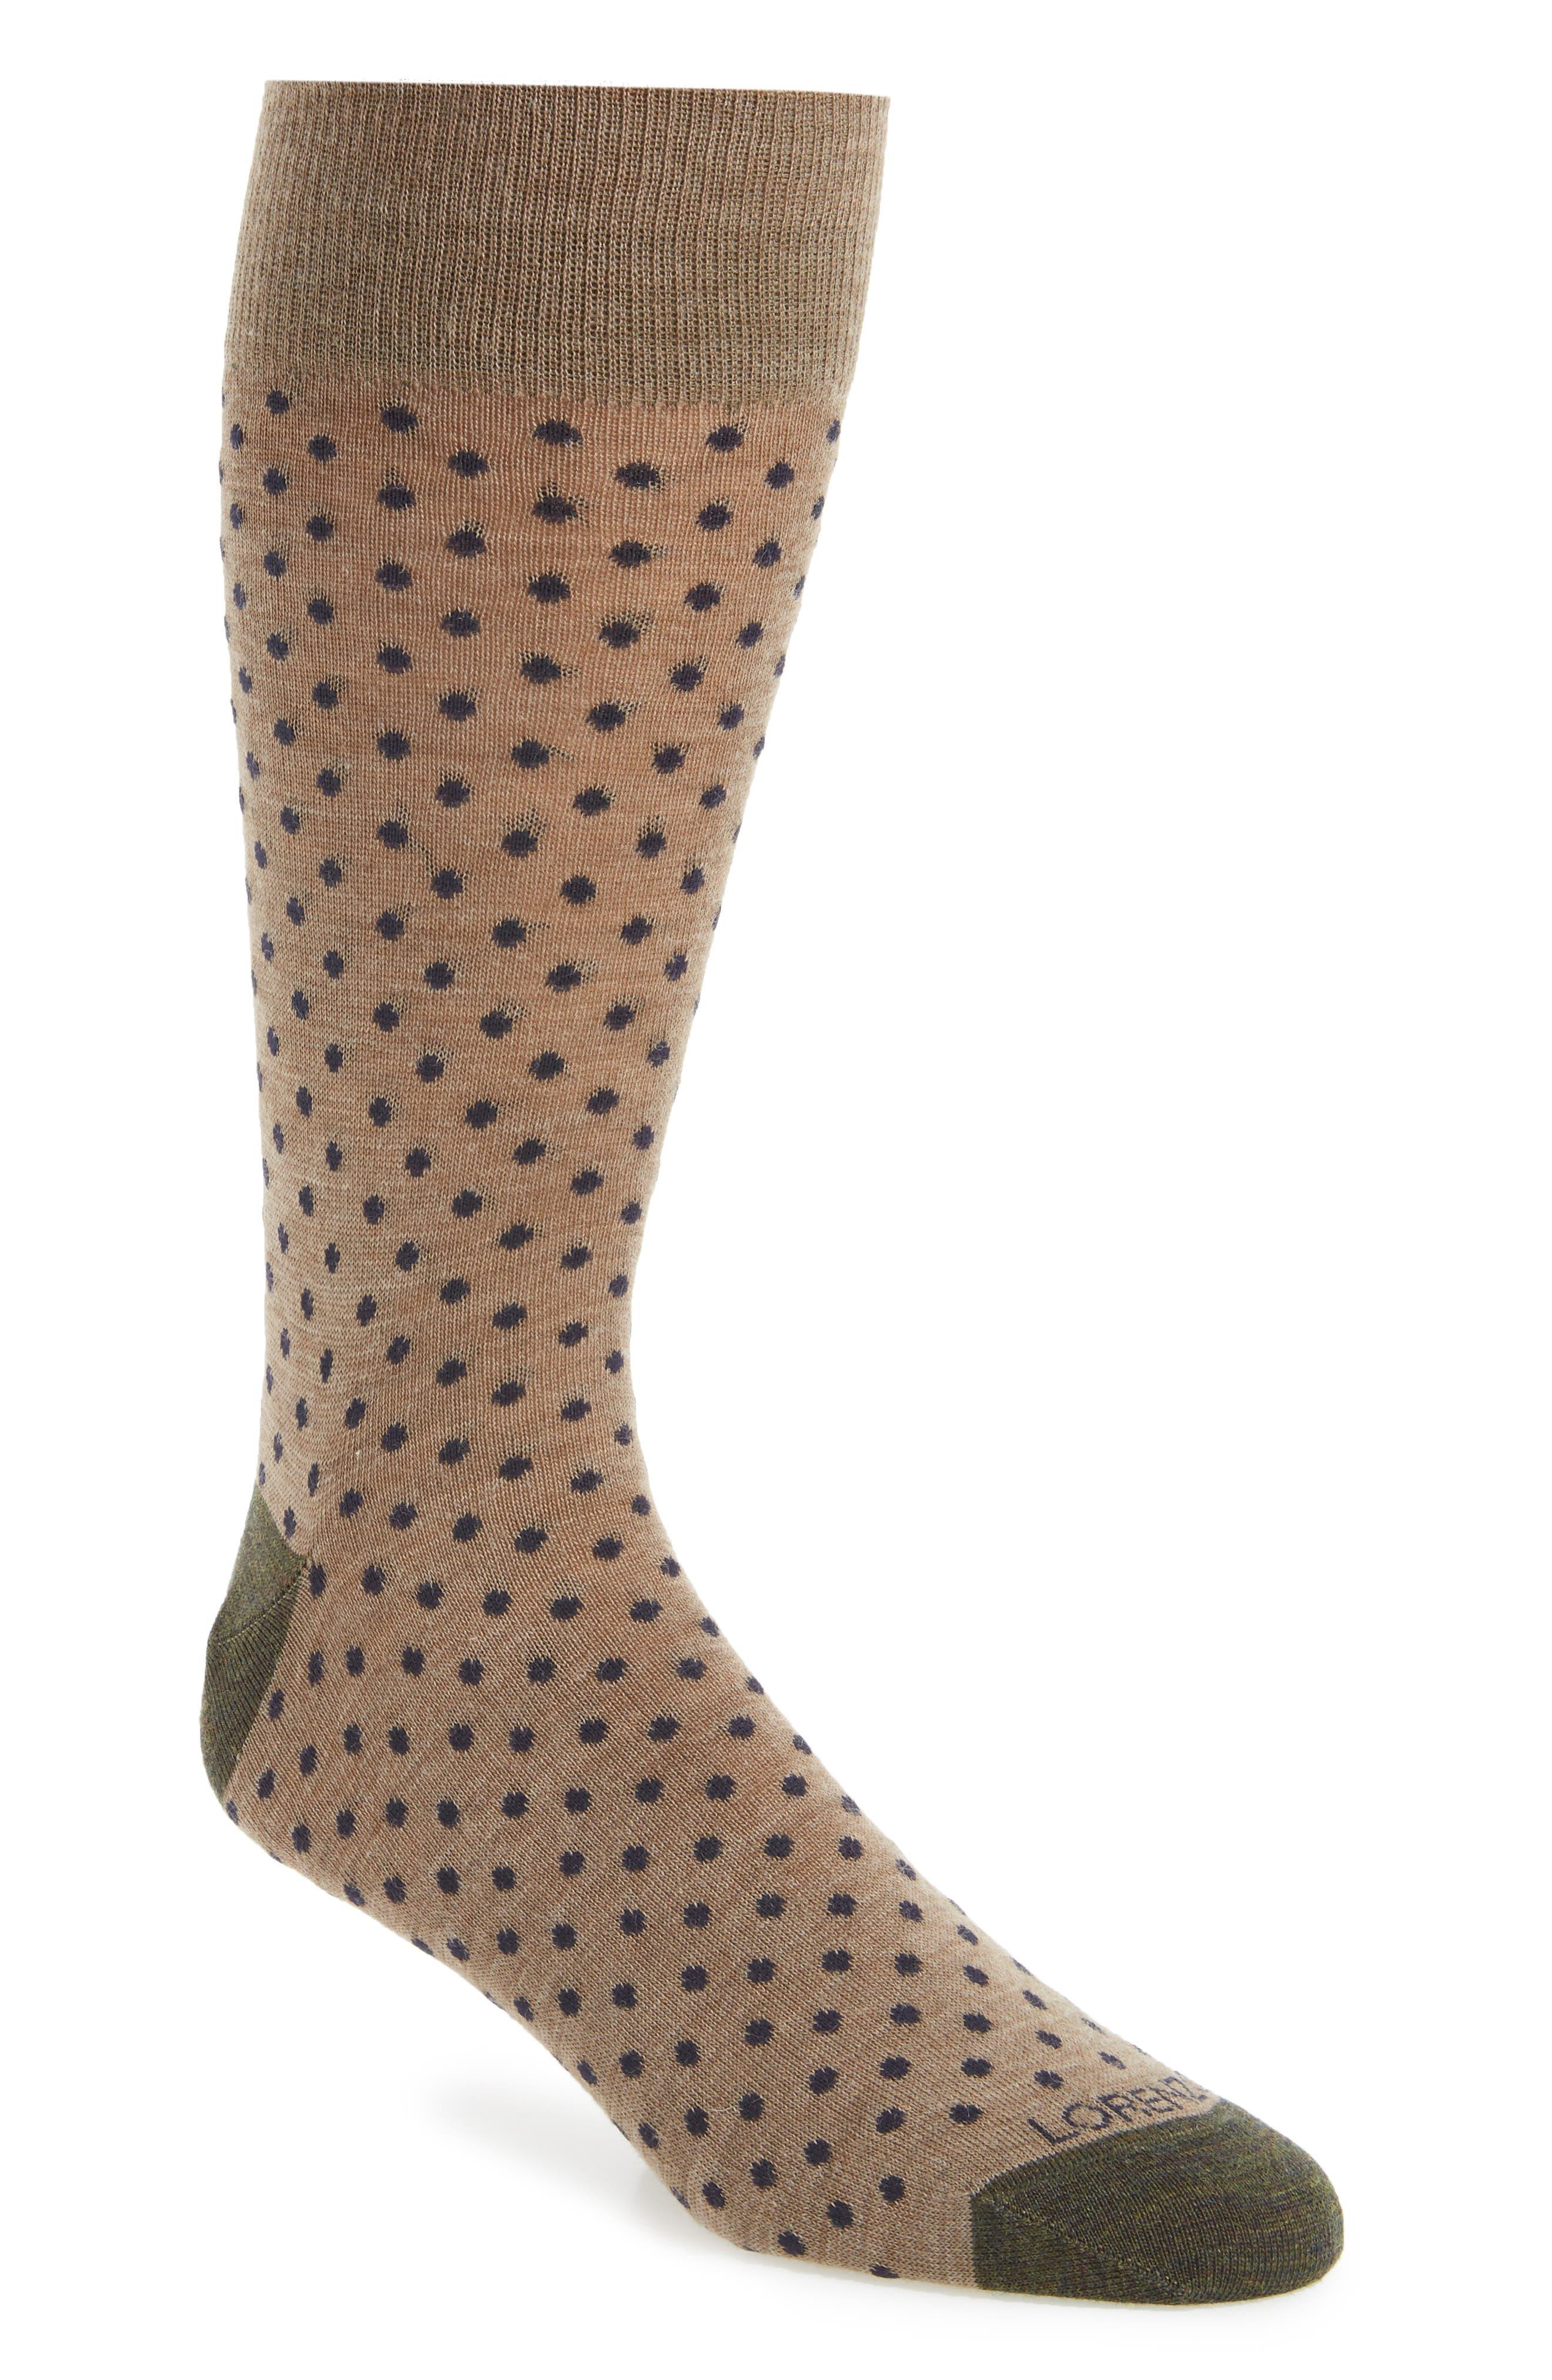 Alternate Image 1 Selected - Lorenzo Uomo Dot Socks (3 for $30)